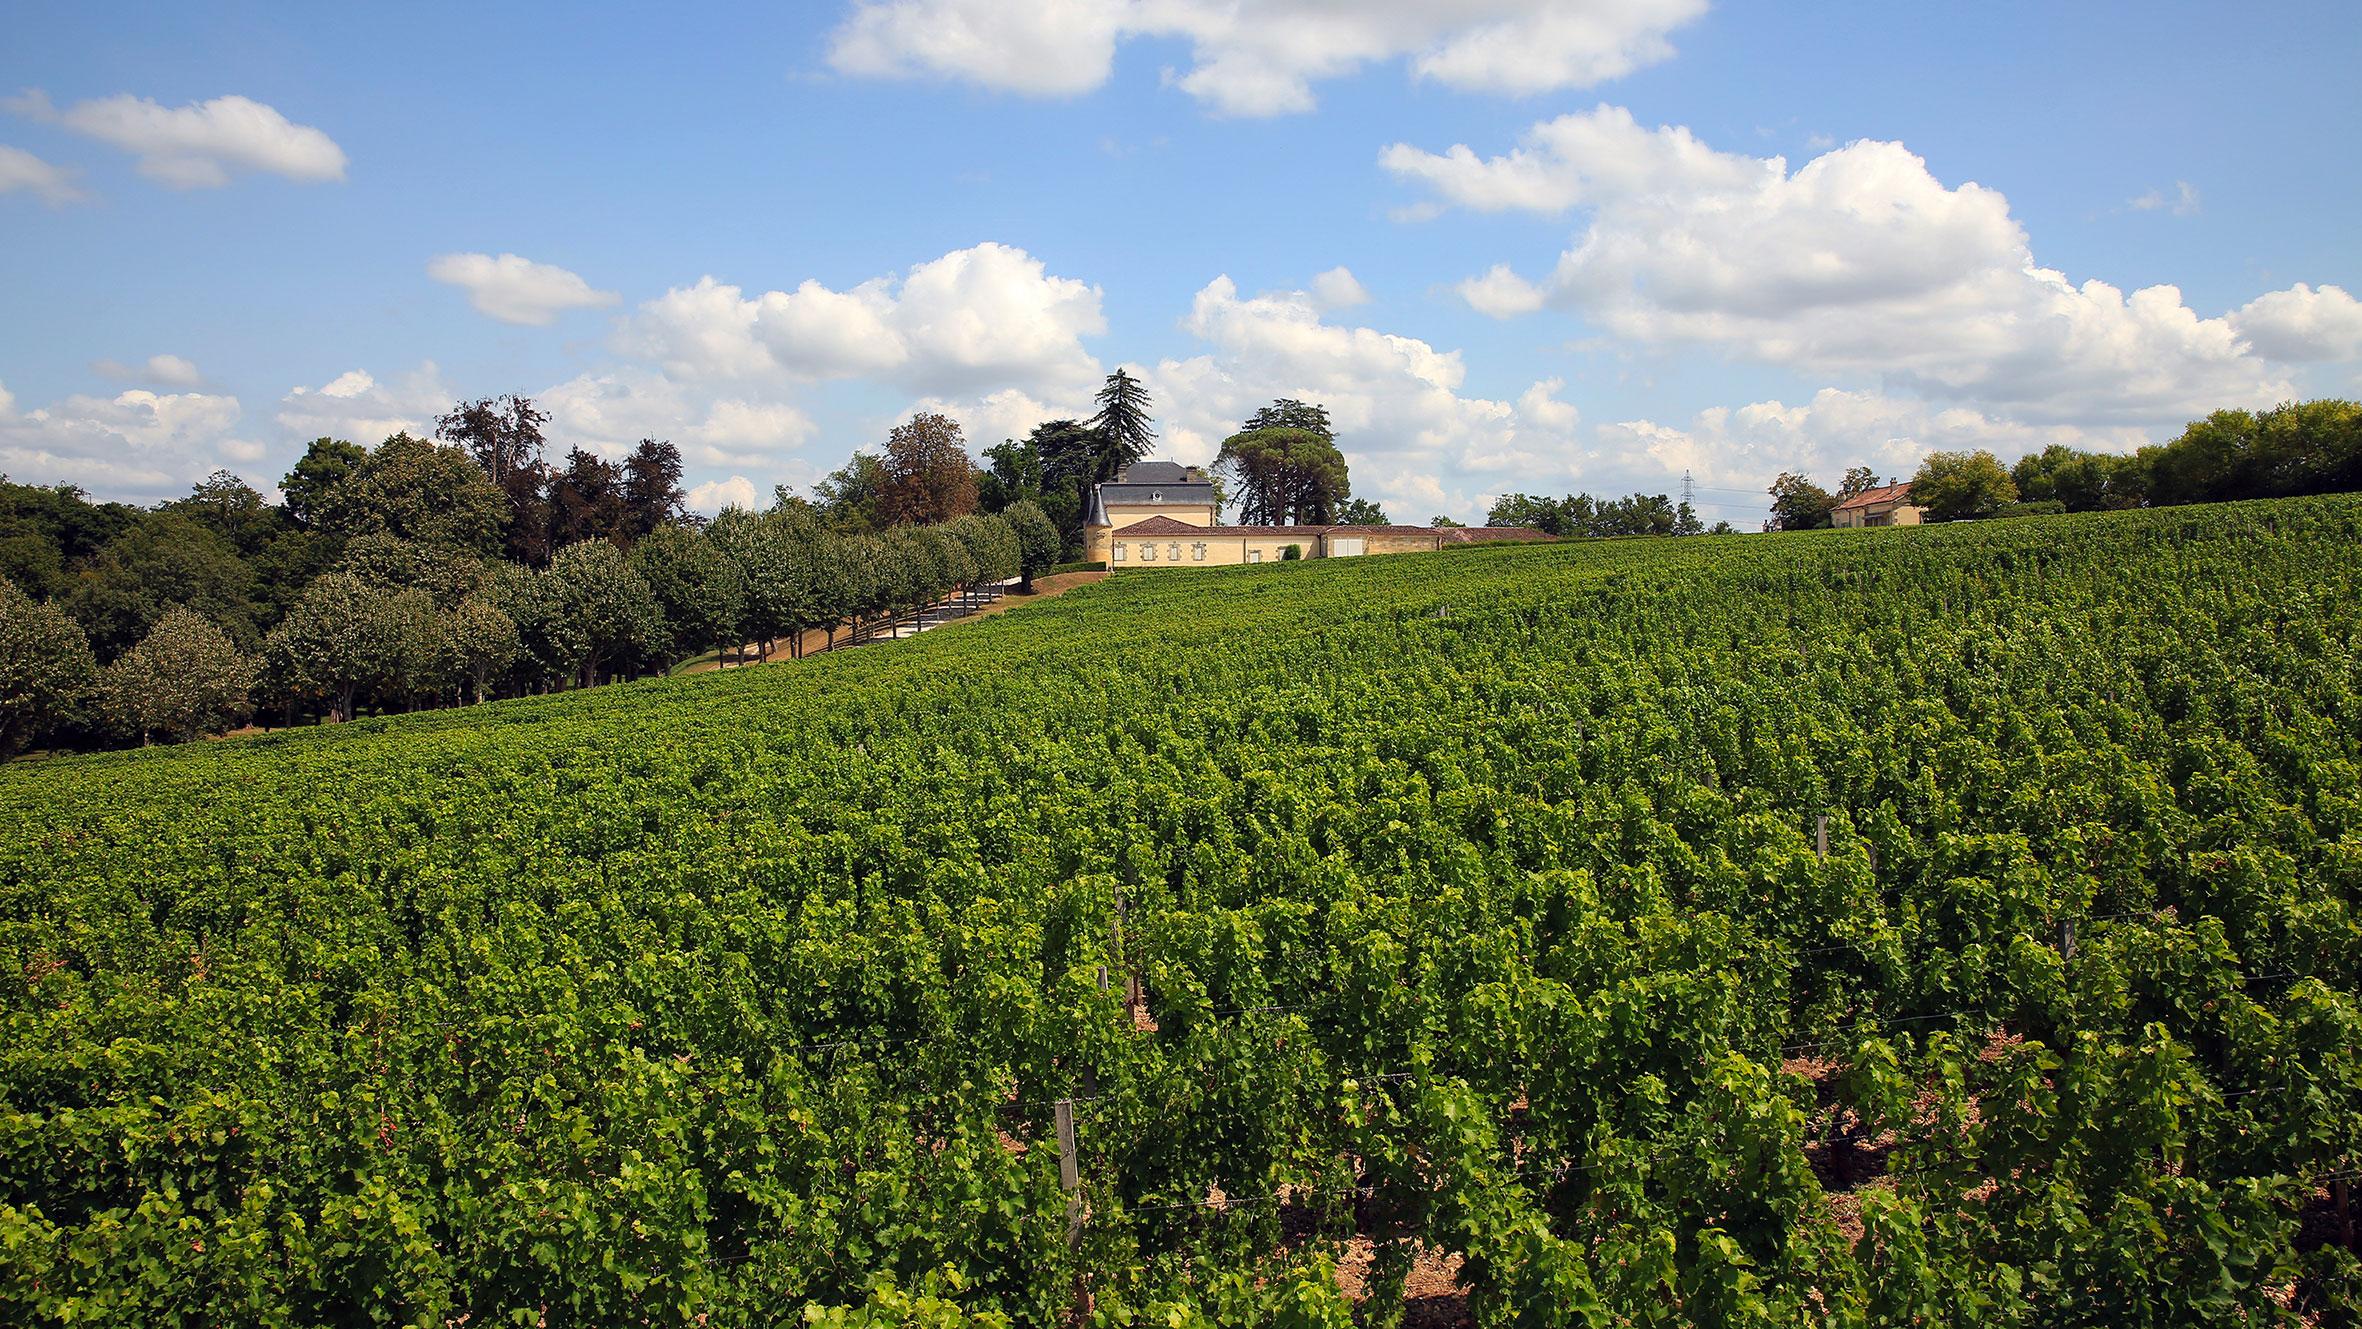 The vineyard at Château Couhins-Lurton